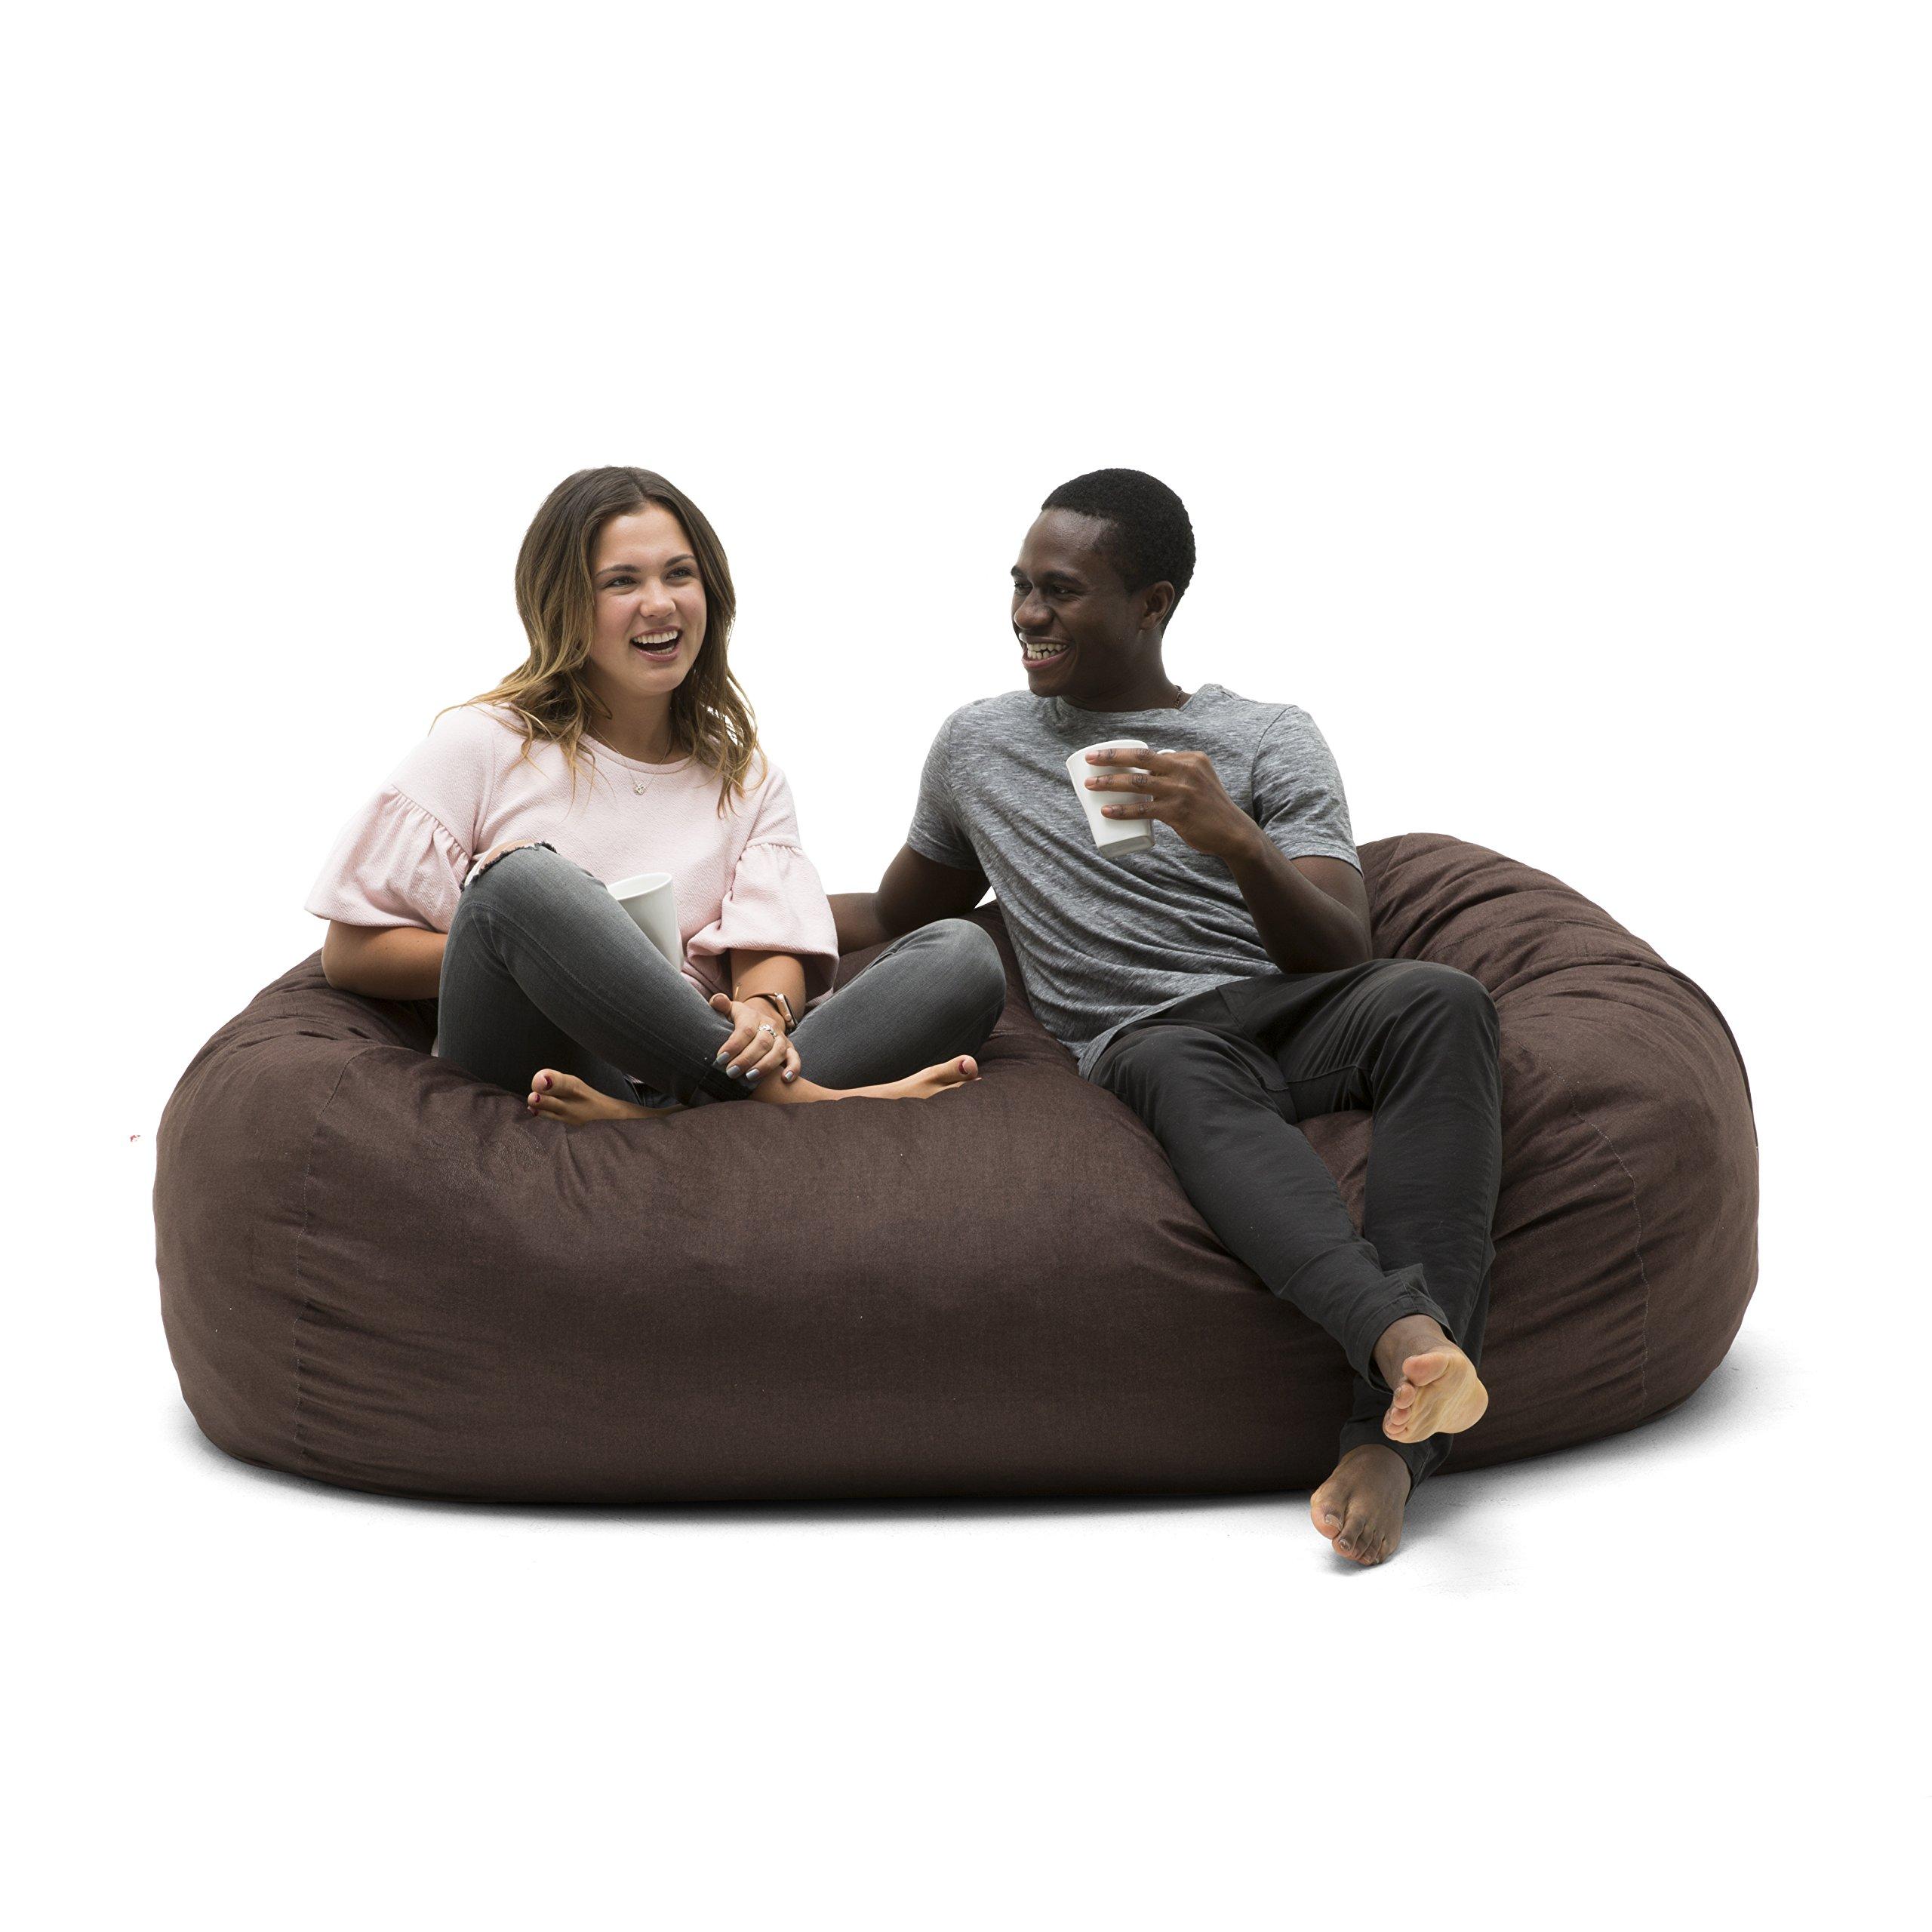 Big Joe 0002656 Media Lounger Foam Filled Bean Bag Chair, Cocoa Lenox by Big Joe